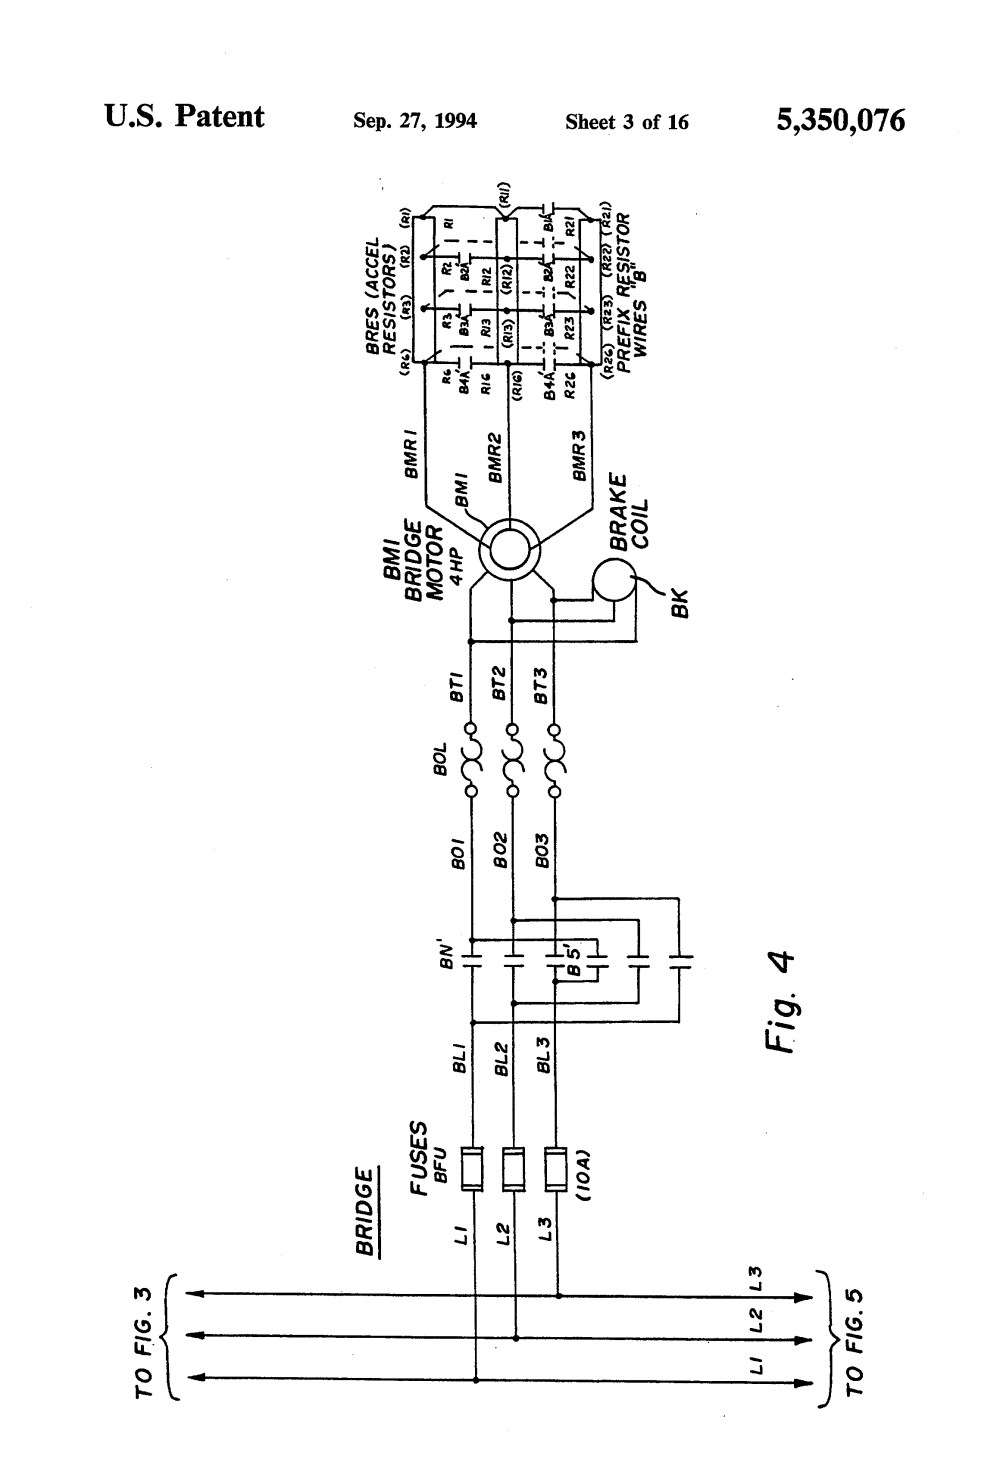 medium resolution of kone hoist wiring diagram electrical engineering wiring diagramkone hoist wiring diagram little wiring diagramskone crane wiring